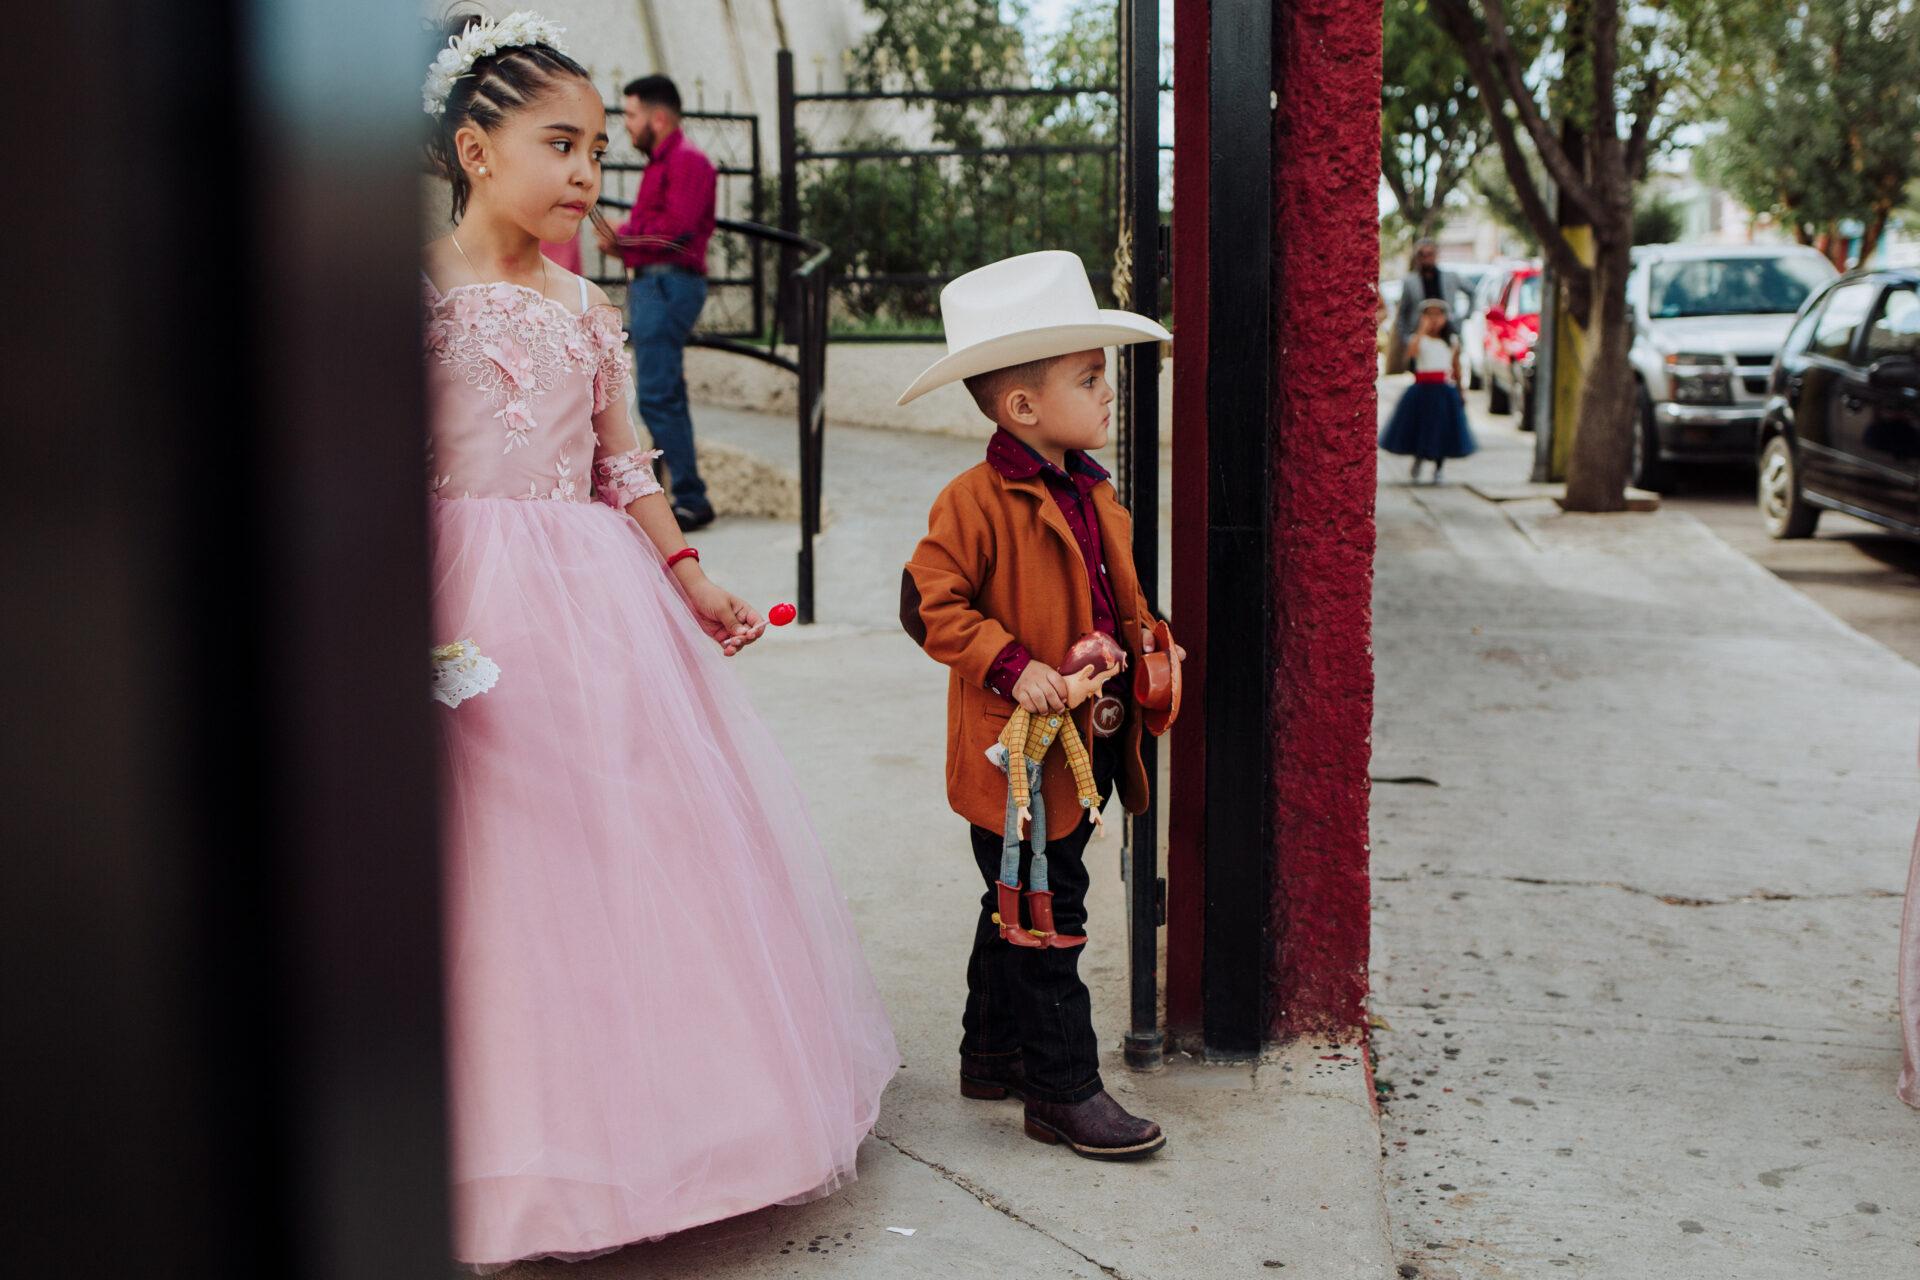 javier_noriega_fotografo_bodas_zacatecas_fresnillo_chihuahua_wedding_photographer5